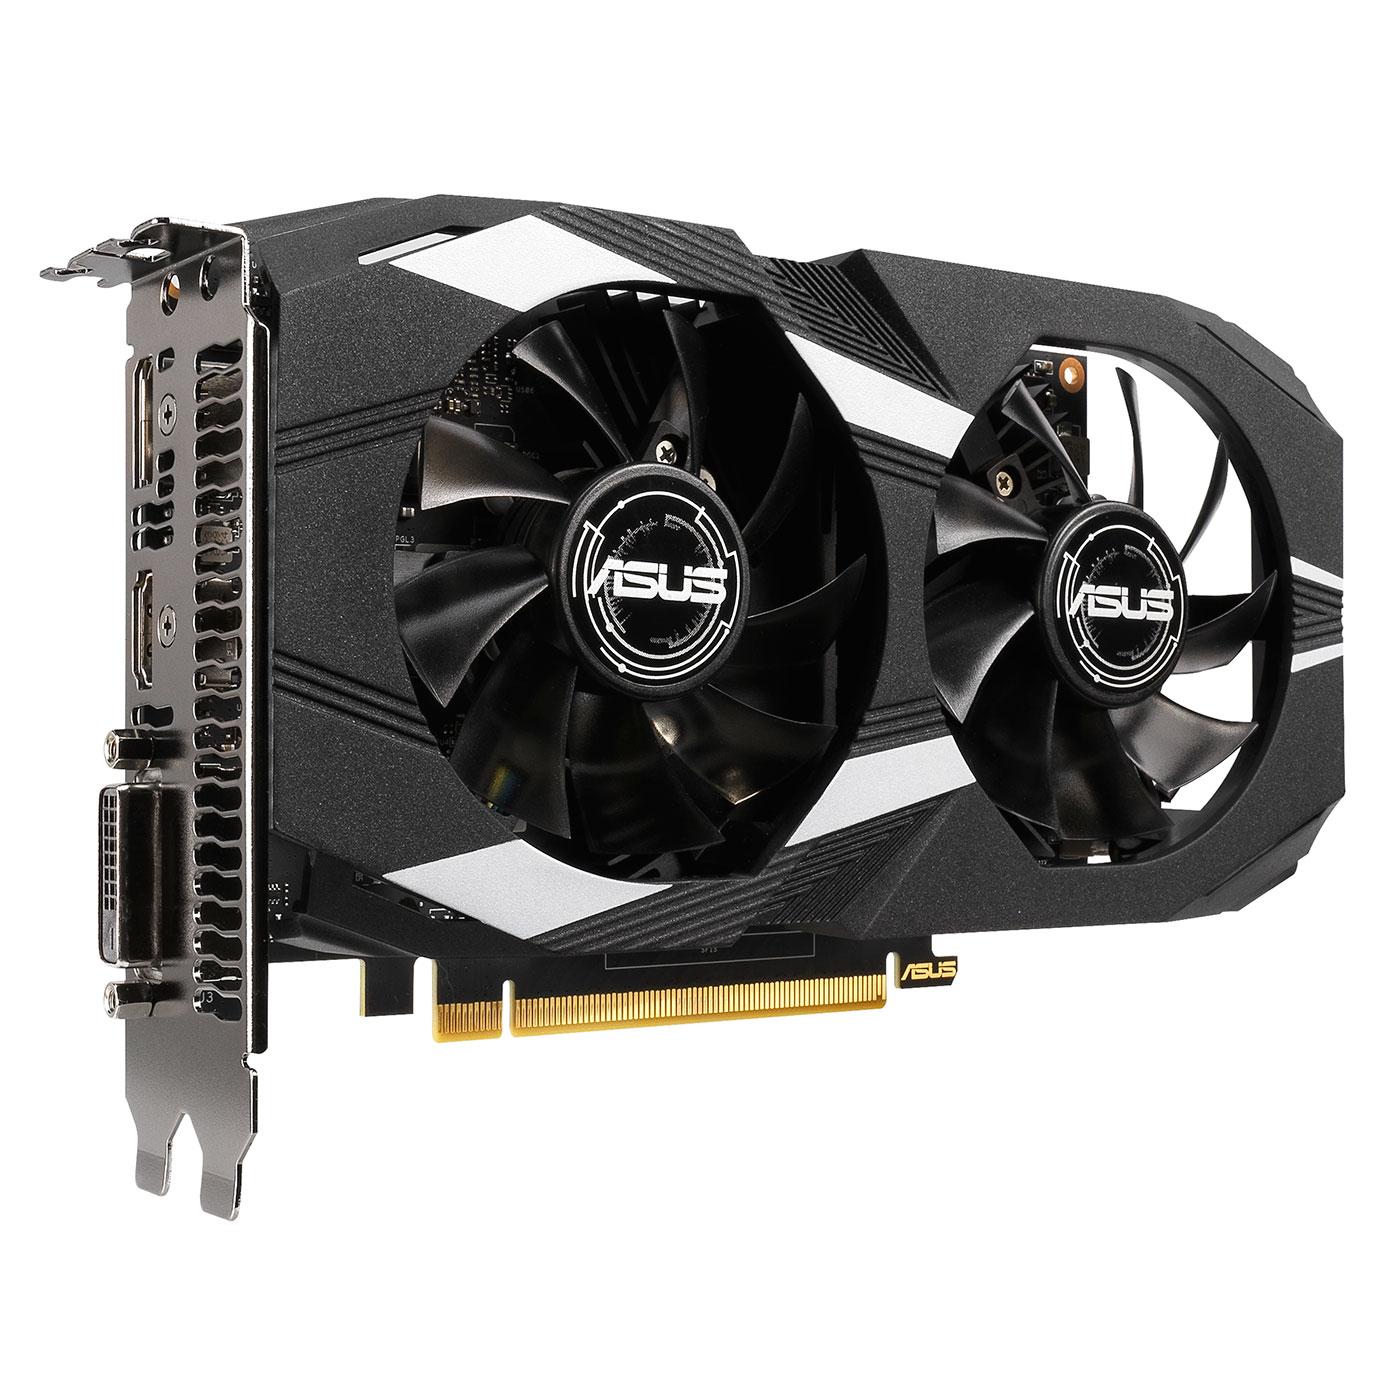 ASUS GeForce GTX 1650 DUAL-GTX1650-4G pas cher - HardWare.fr